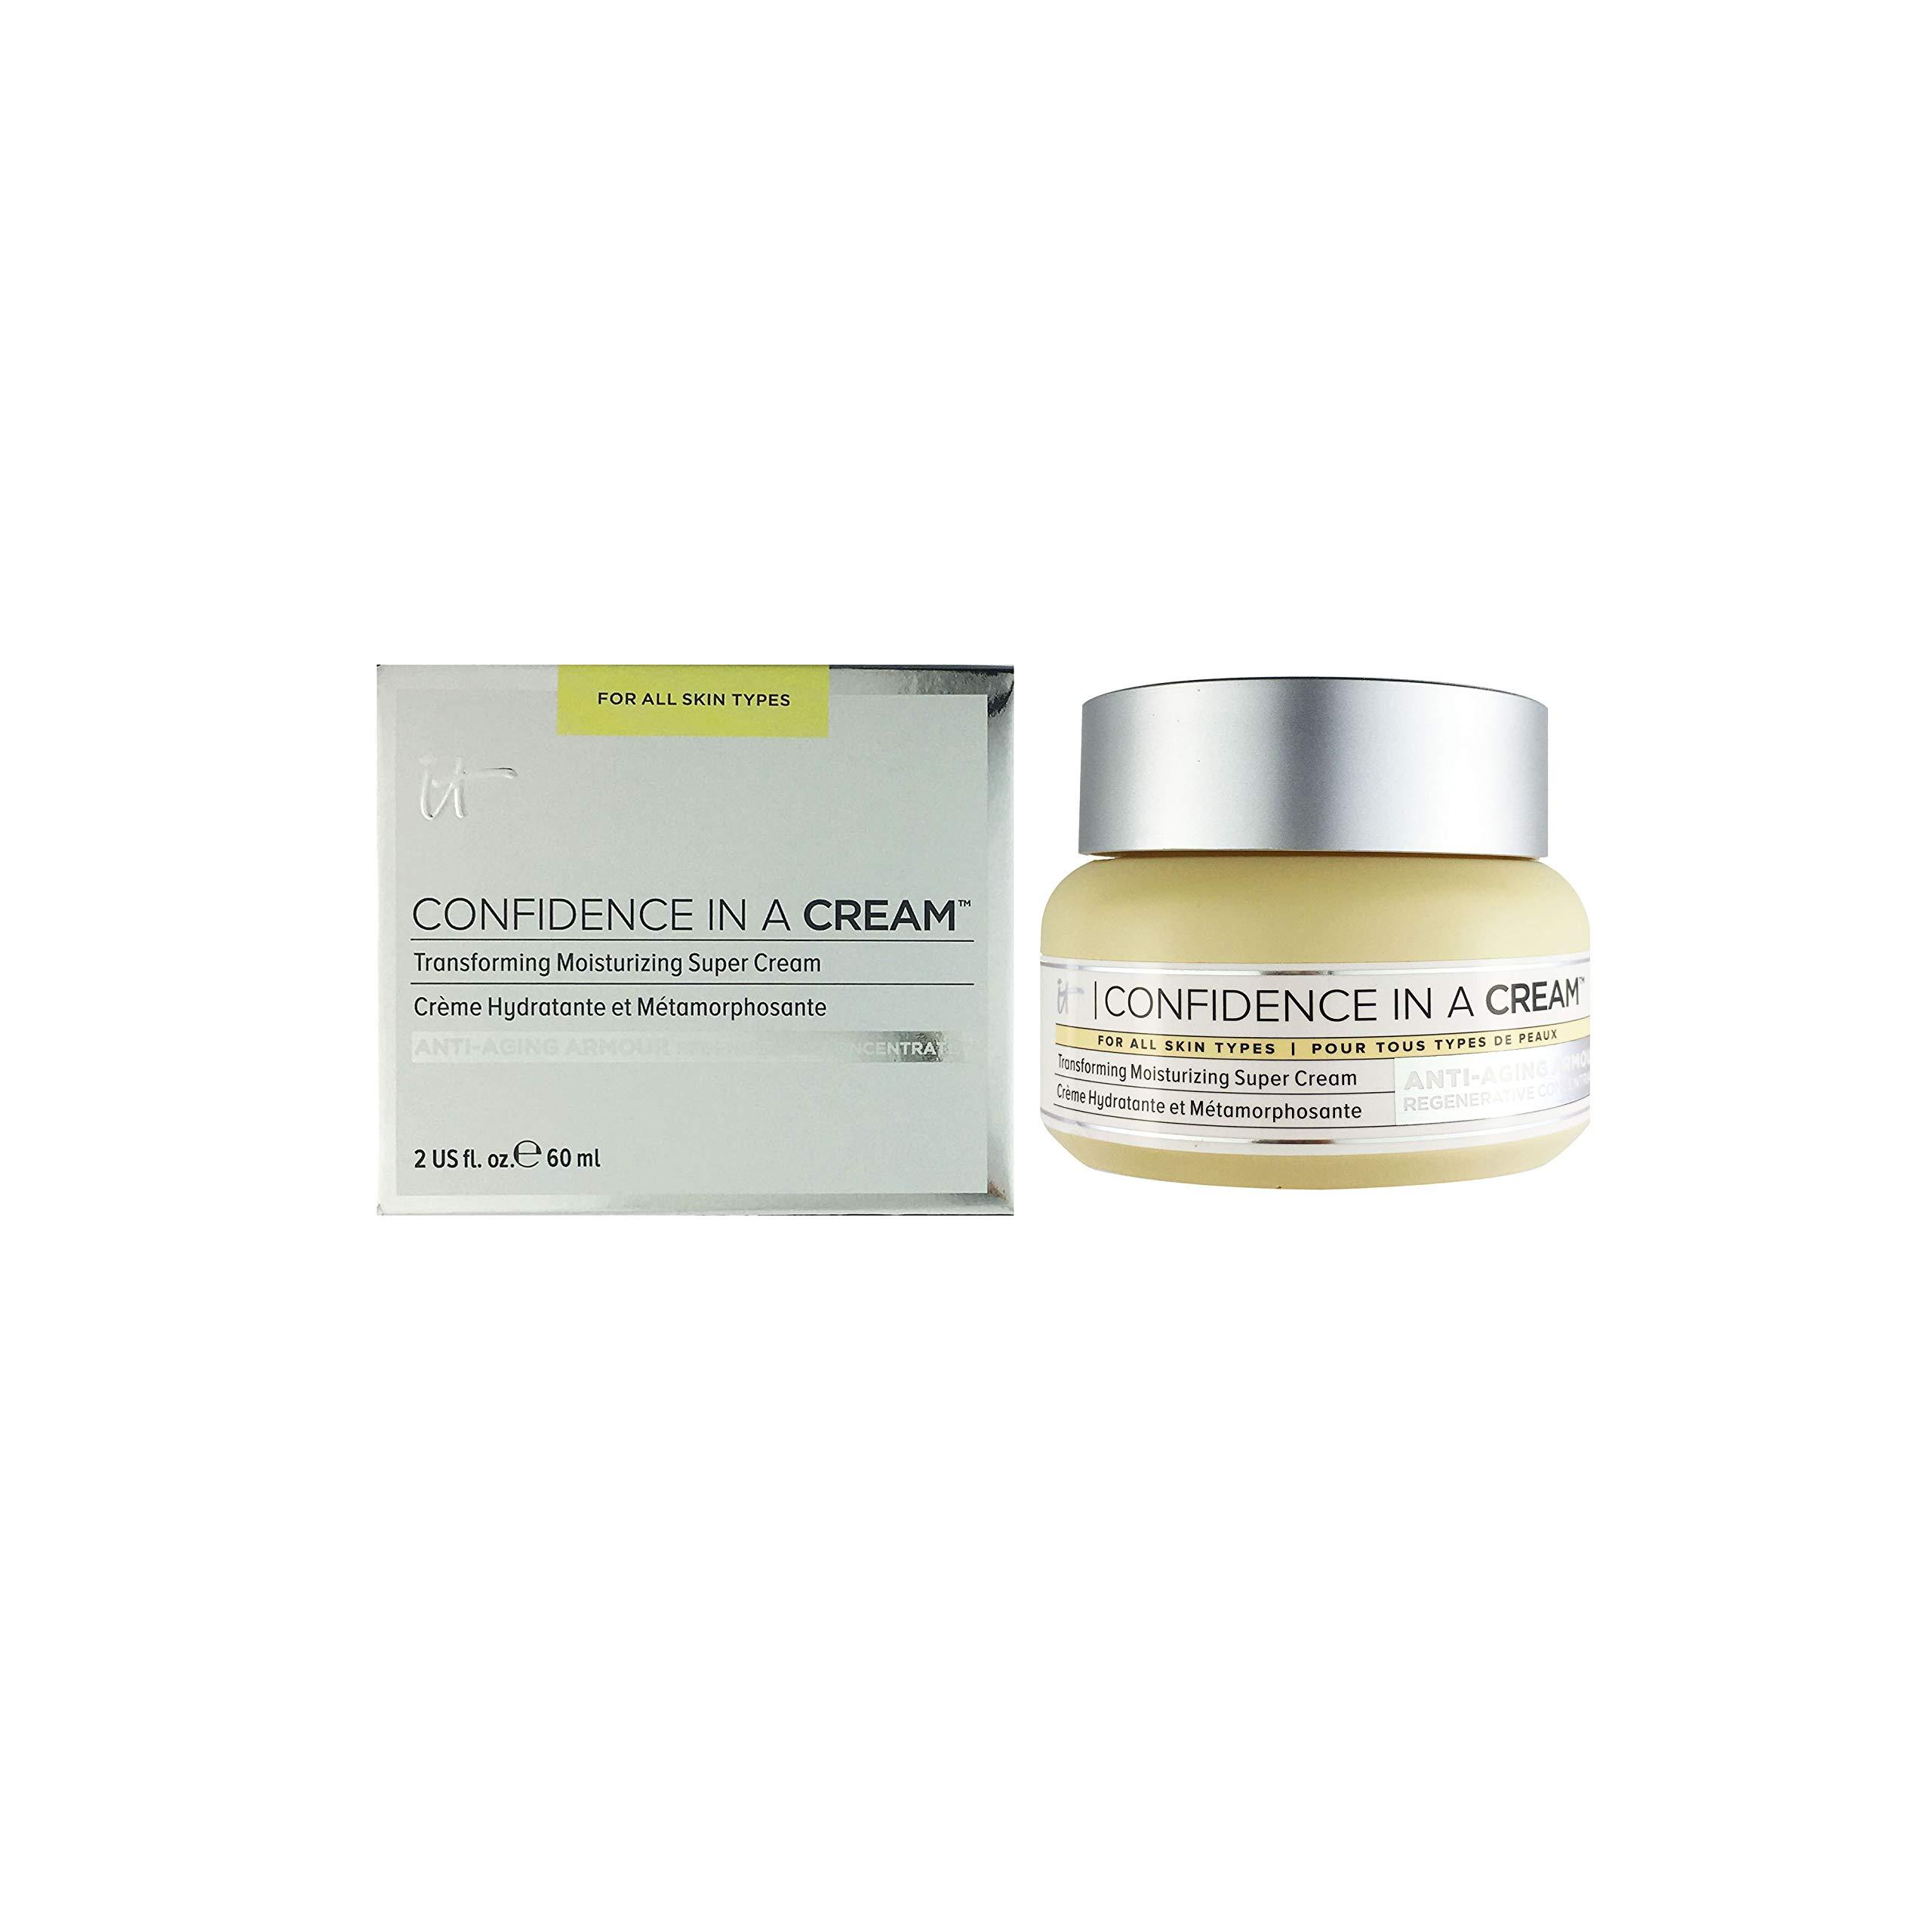 Cosmetics Confidence in a Cream Moisturizing Super Cream Moisturizer 2 oz